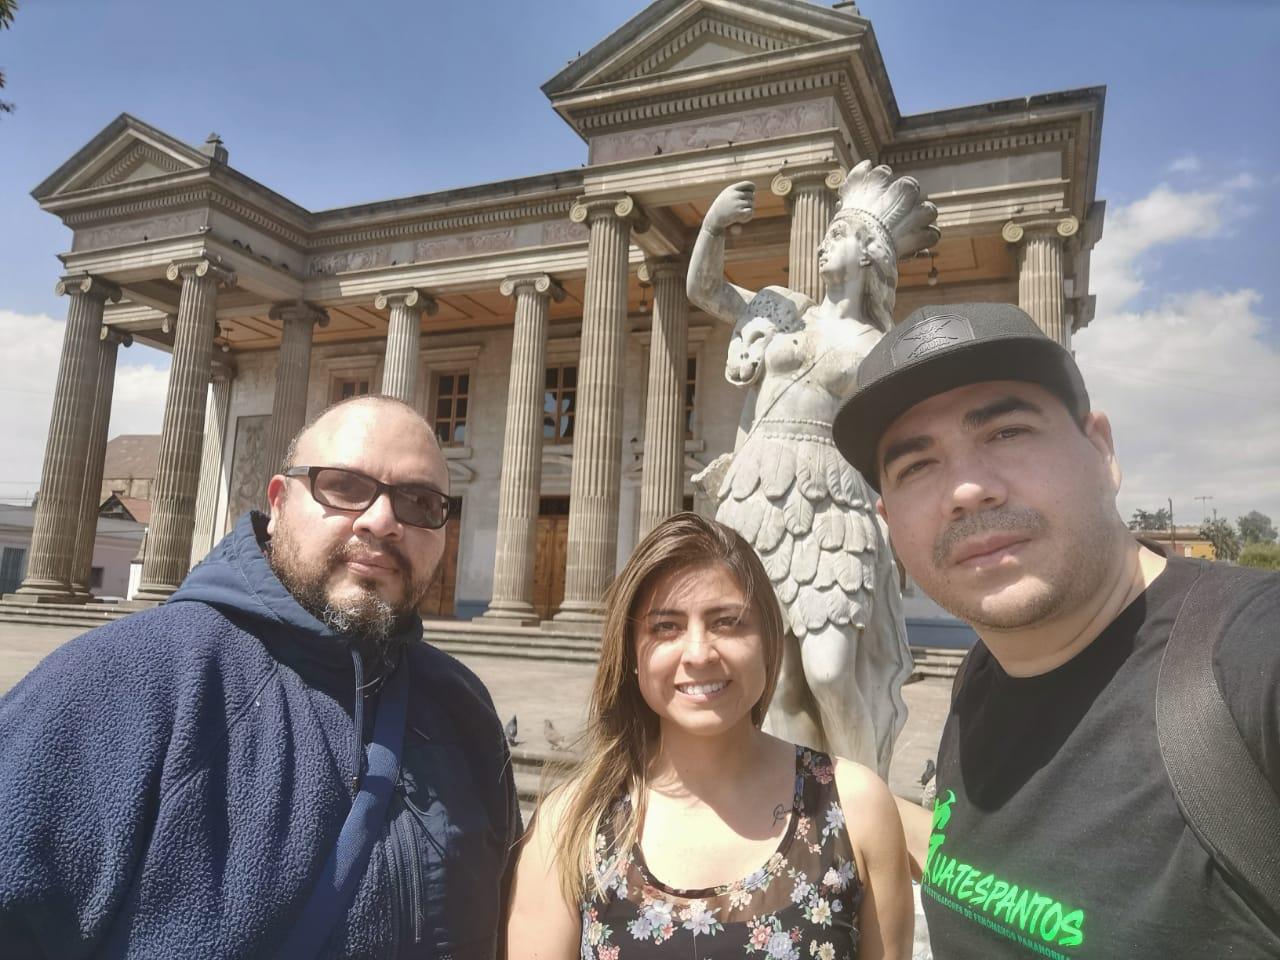 Grupo Guatespantos